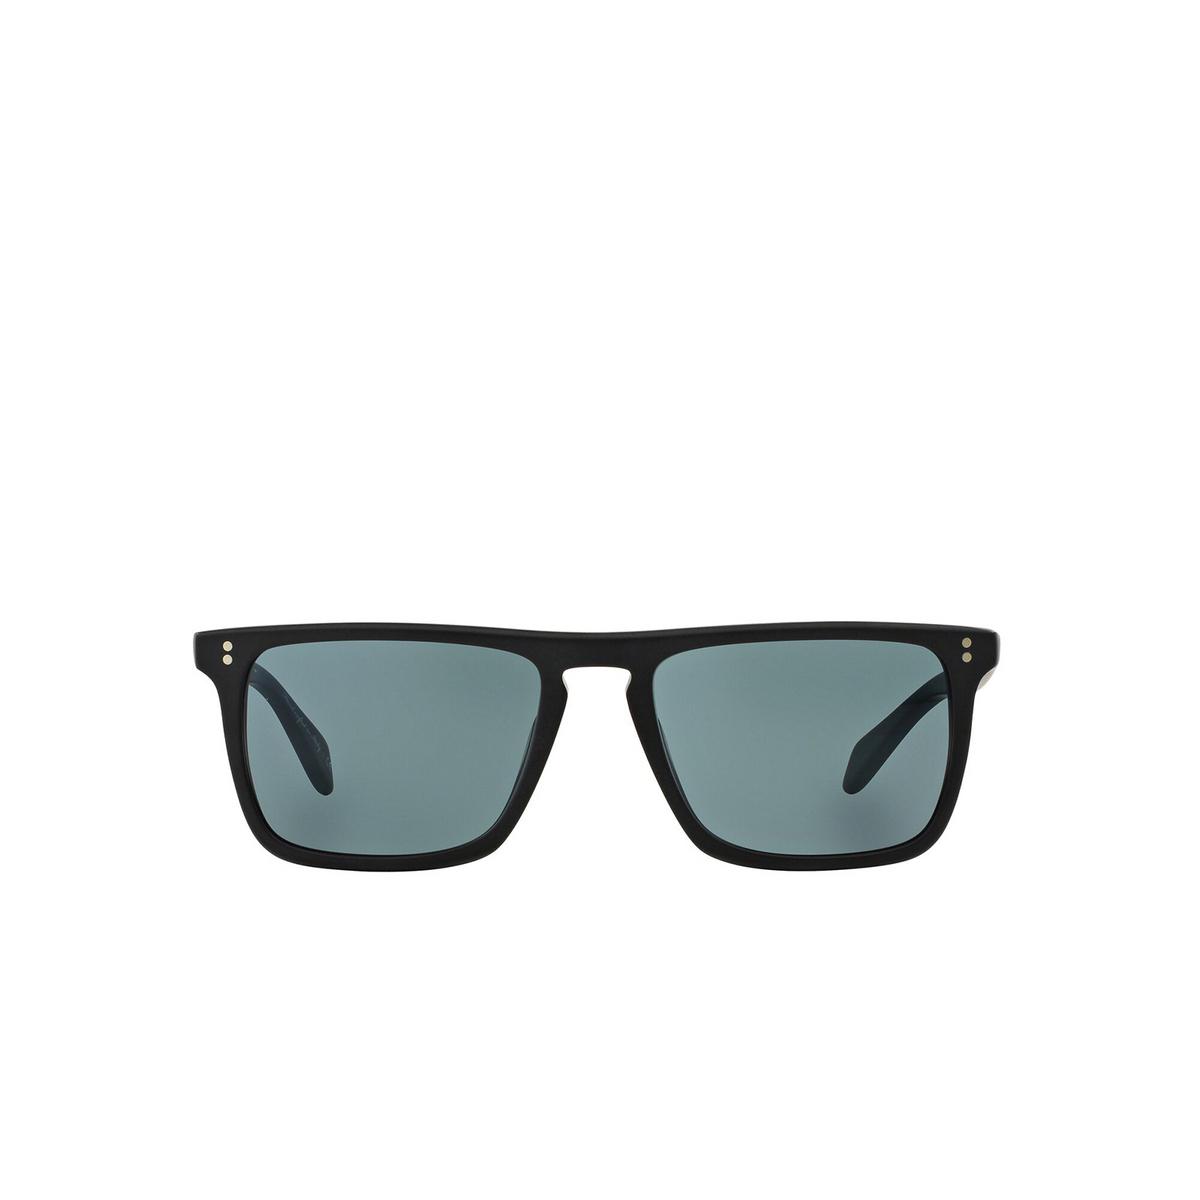 Oliver Peoples® Square Sunglasses: Bernardo OV5189S color Semi Matte Black 1031R8 - front view.